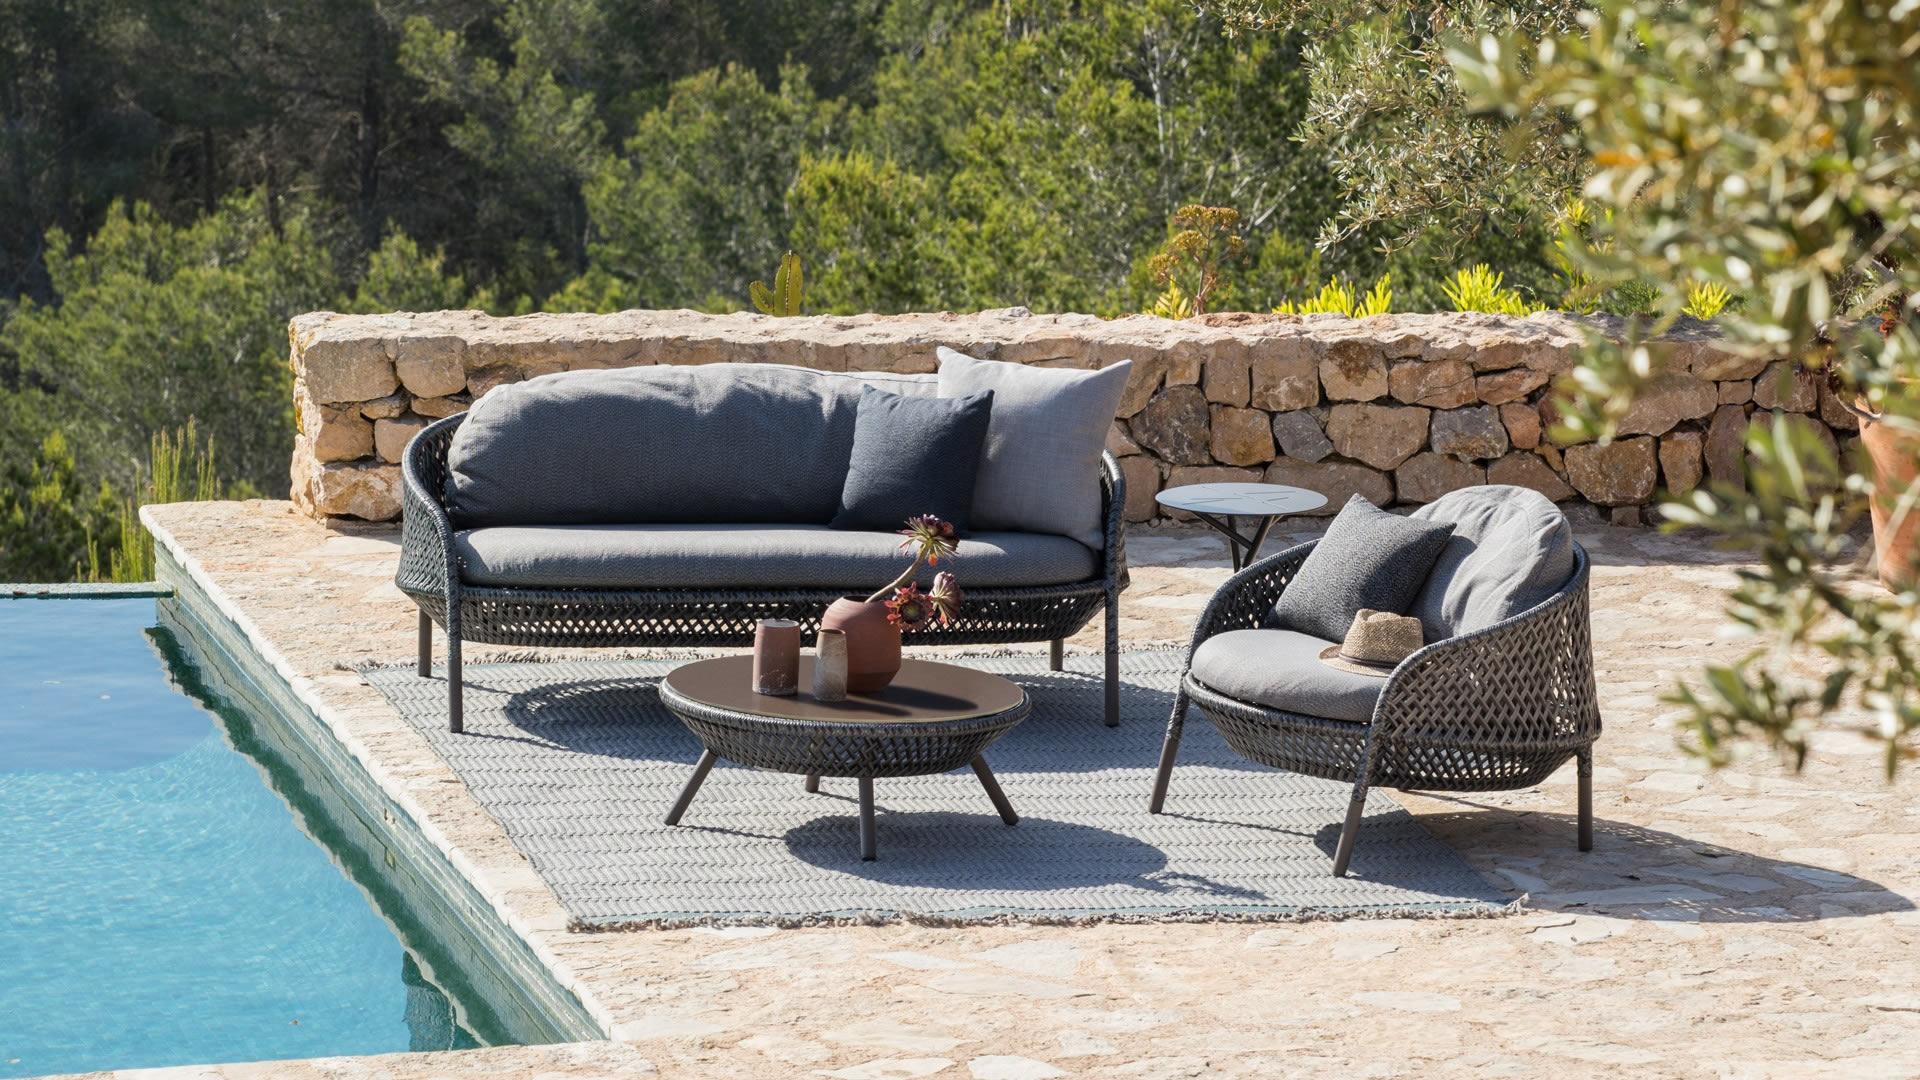 Muebles para jard n dedon - Muebles de jardin en barcelona ...